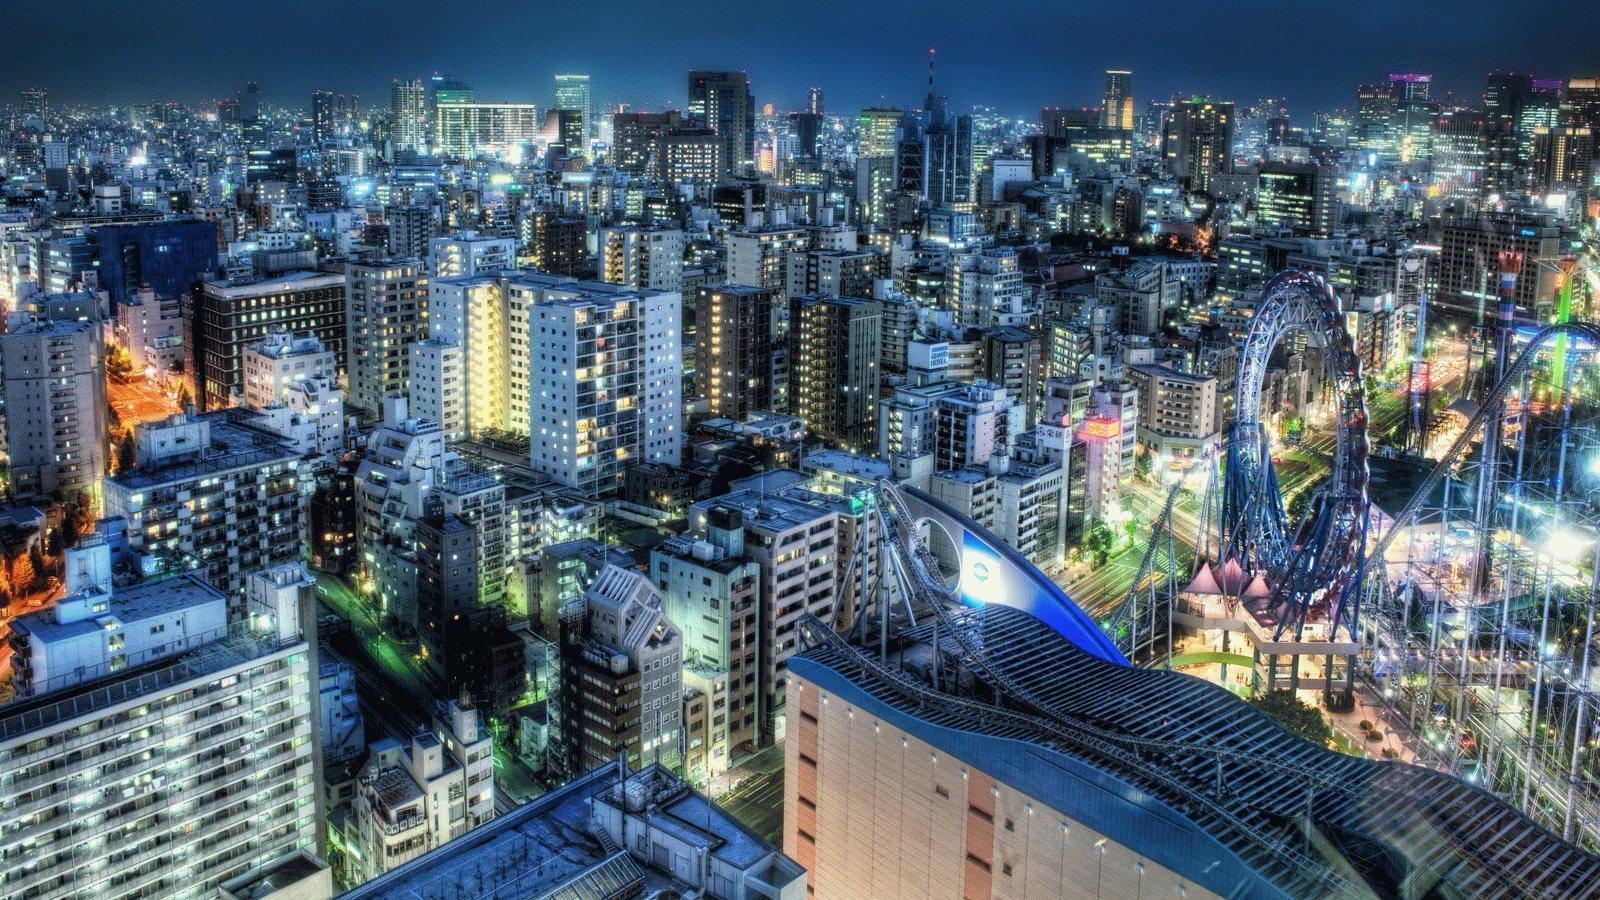 44 Tokyo Hd Wallpaper On Wallpapersafari